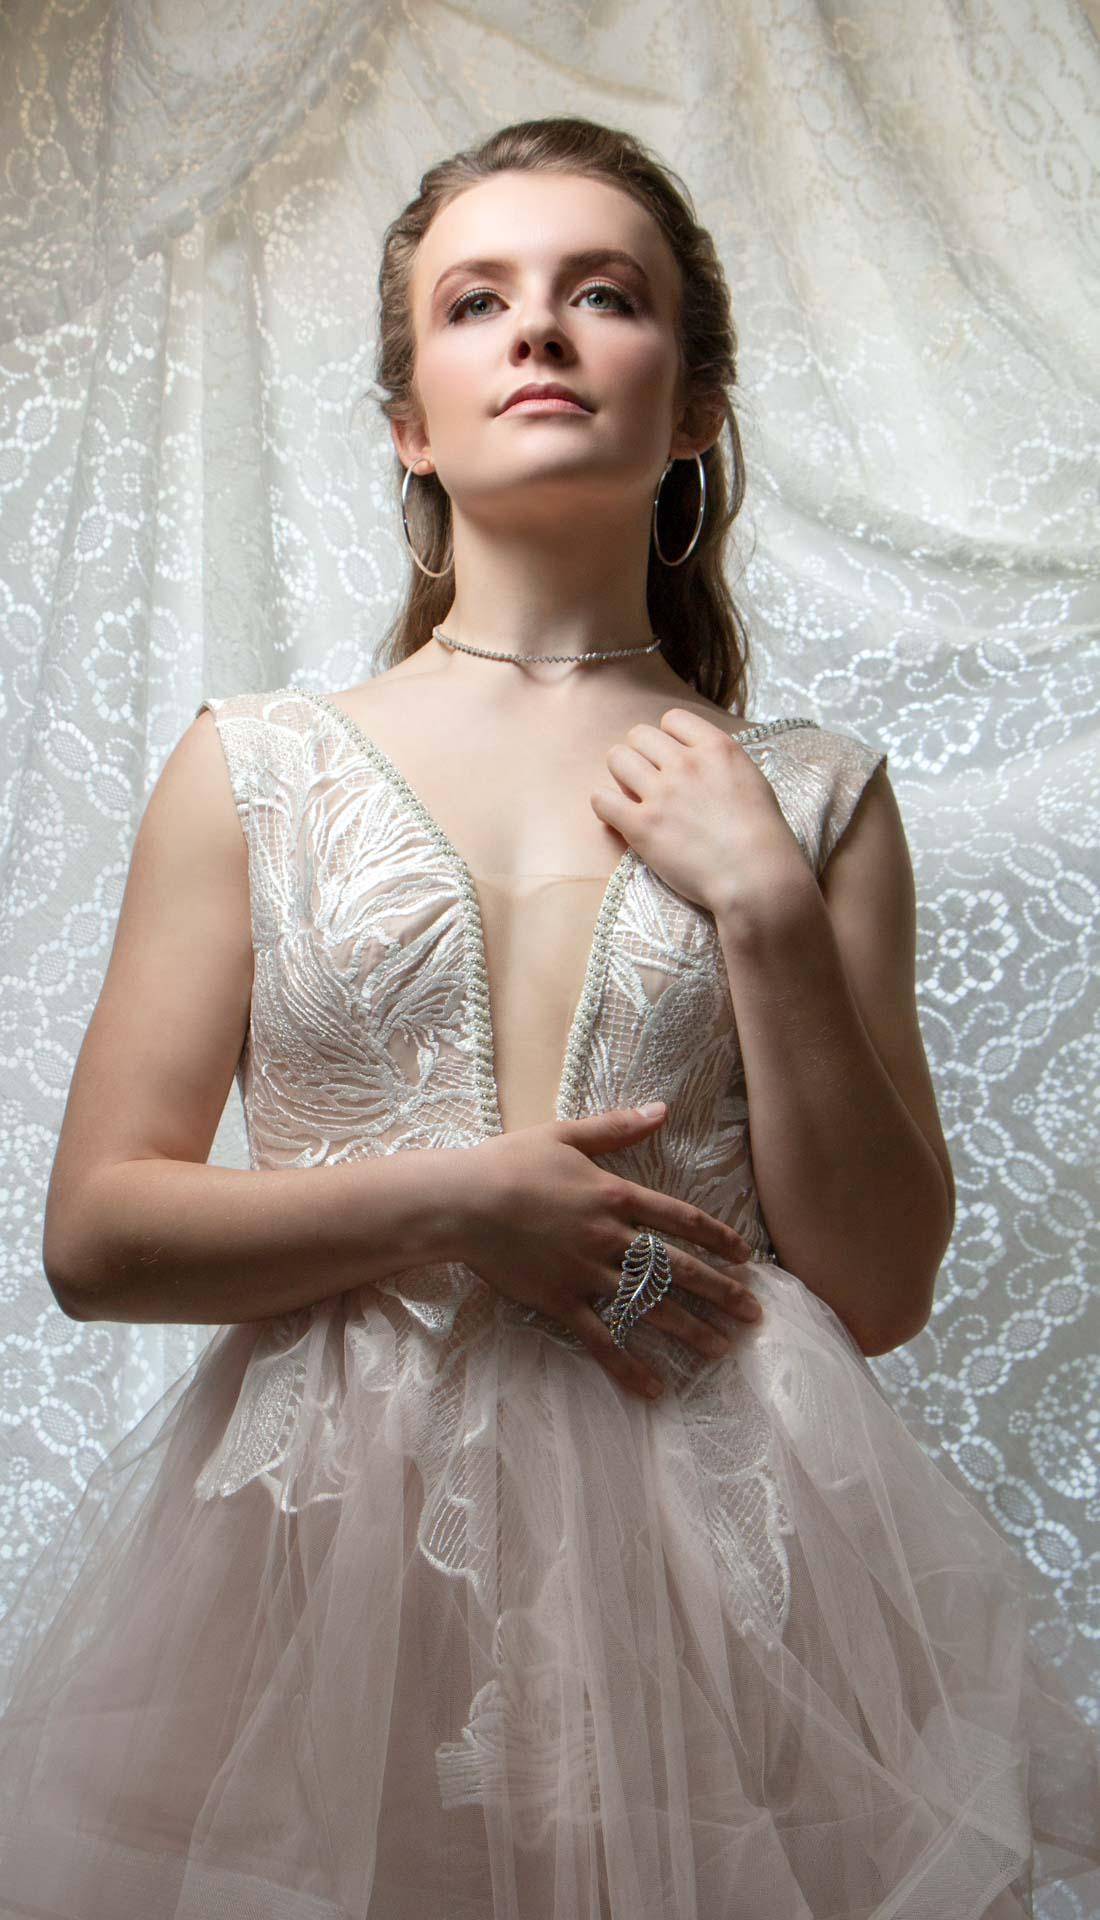 Bridal fashion portrait, bride to be fashion photography, studio fashion photoshoot Birmingham and West Midlands